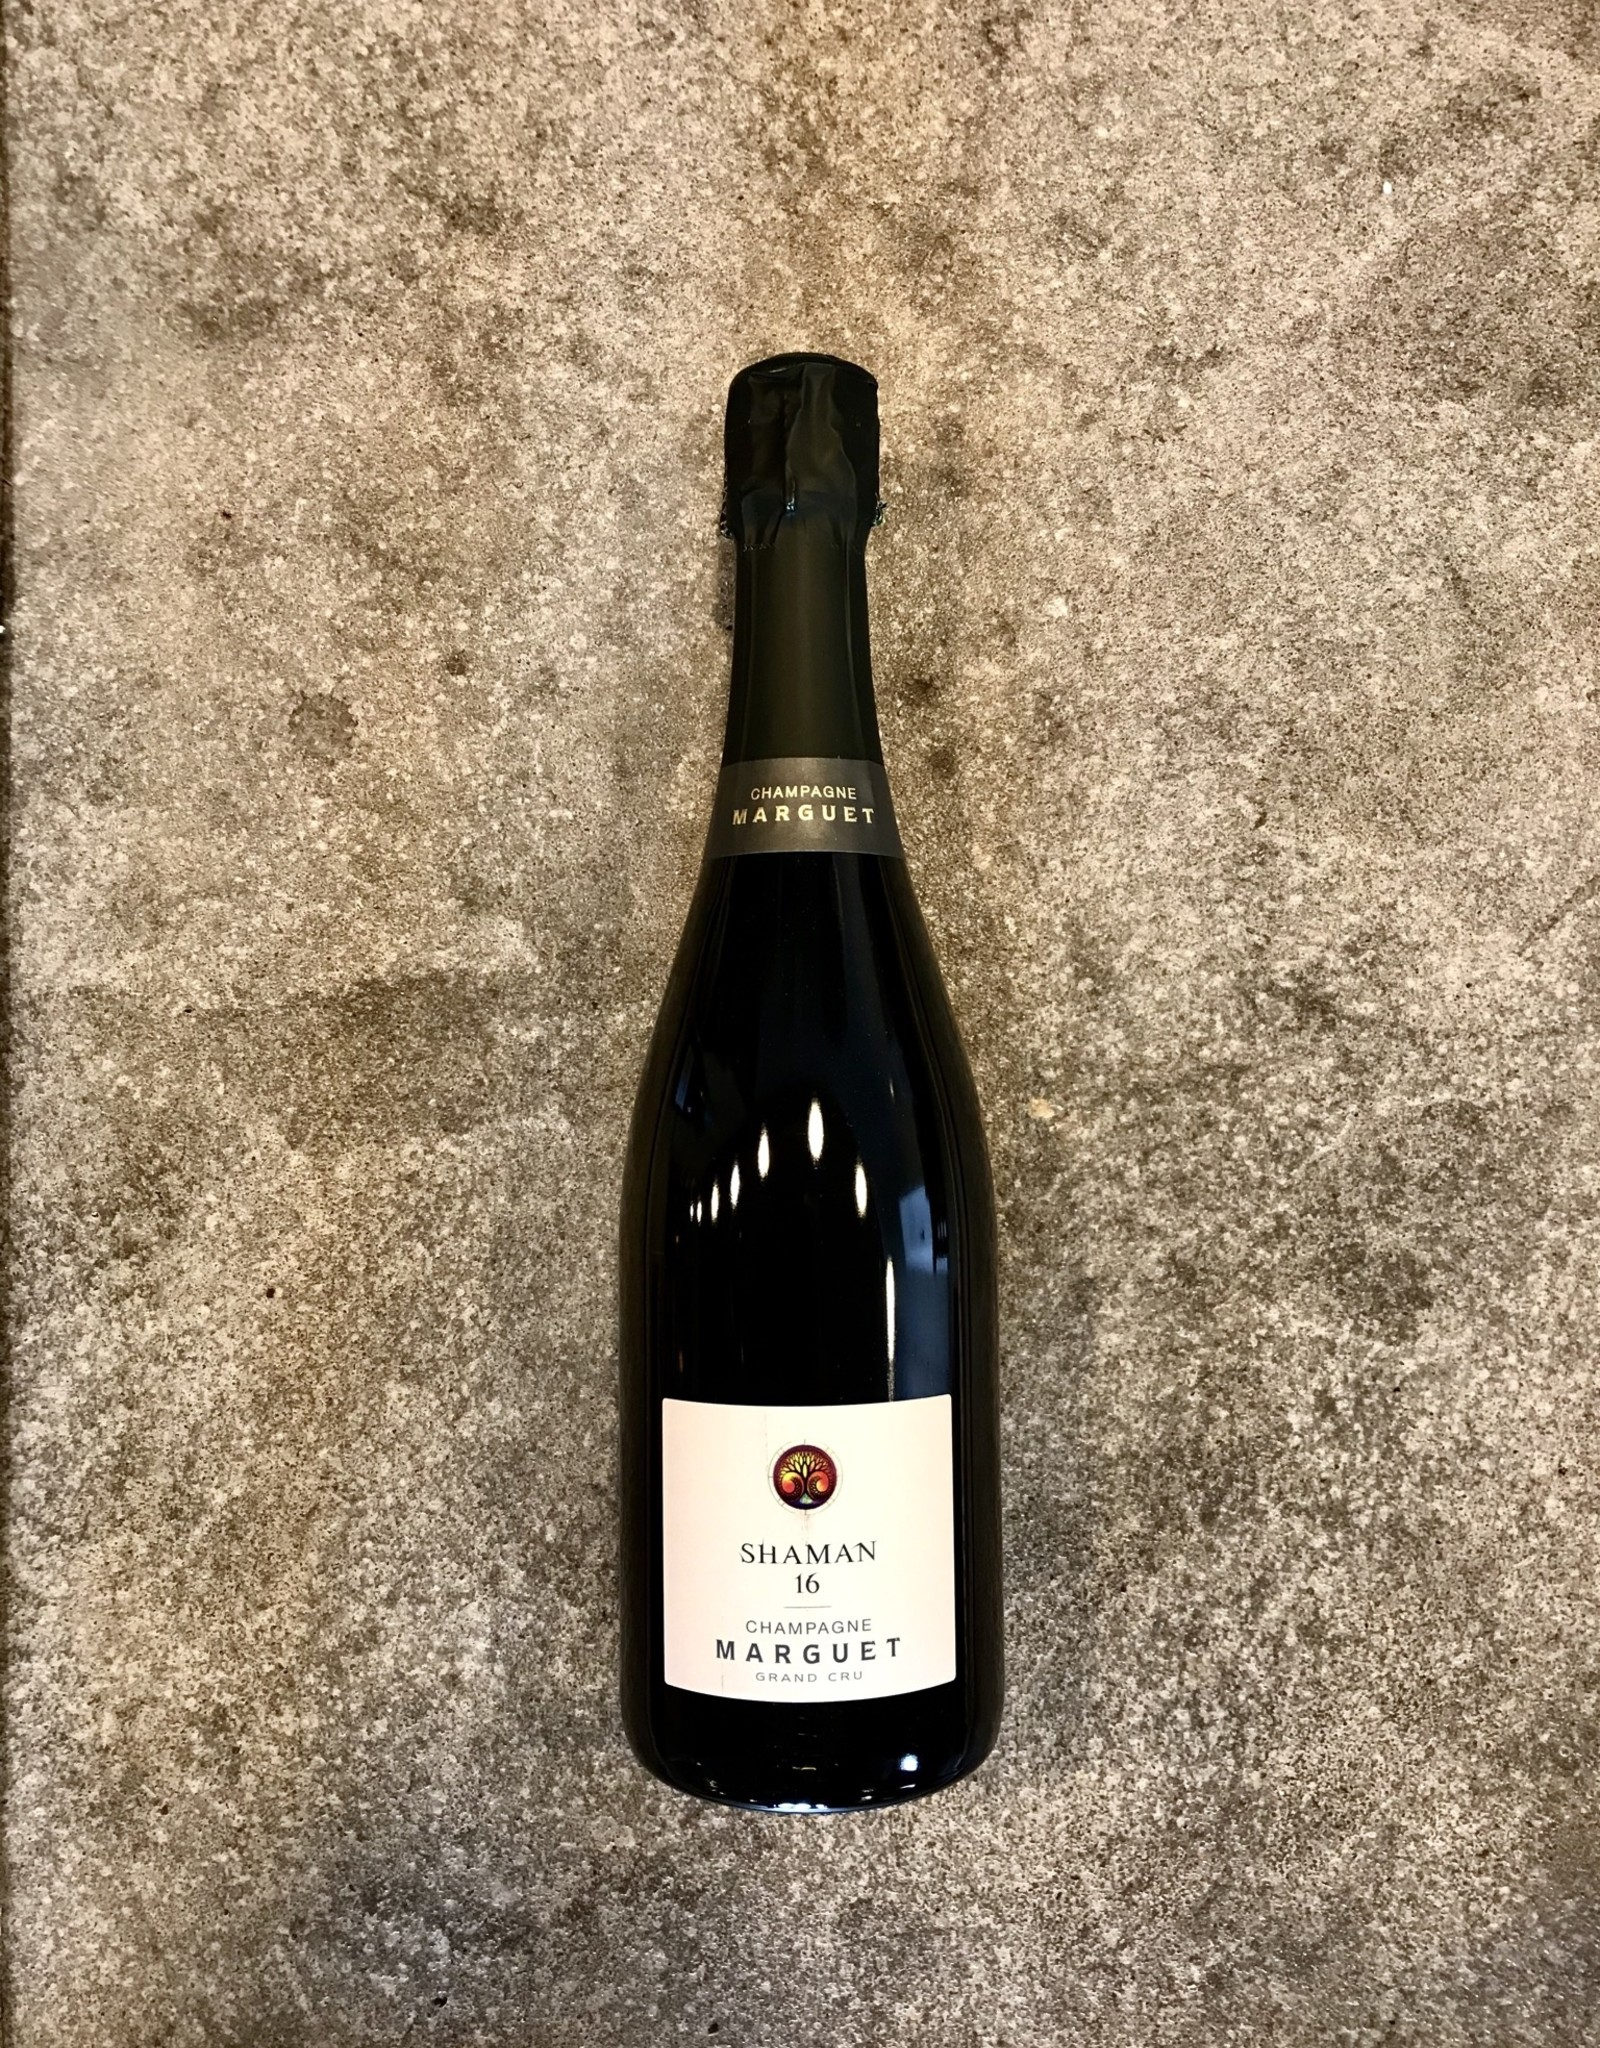 Champagne Marguet Shaman Grand Cru Extra Brut 2016